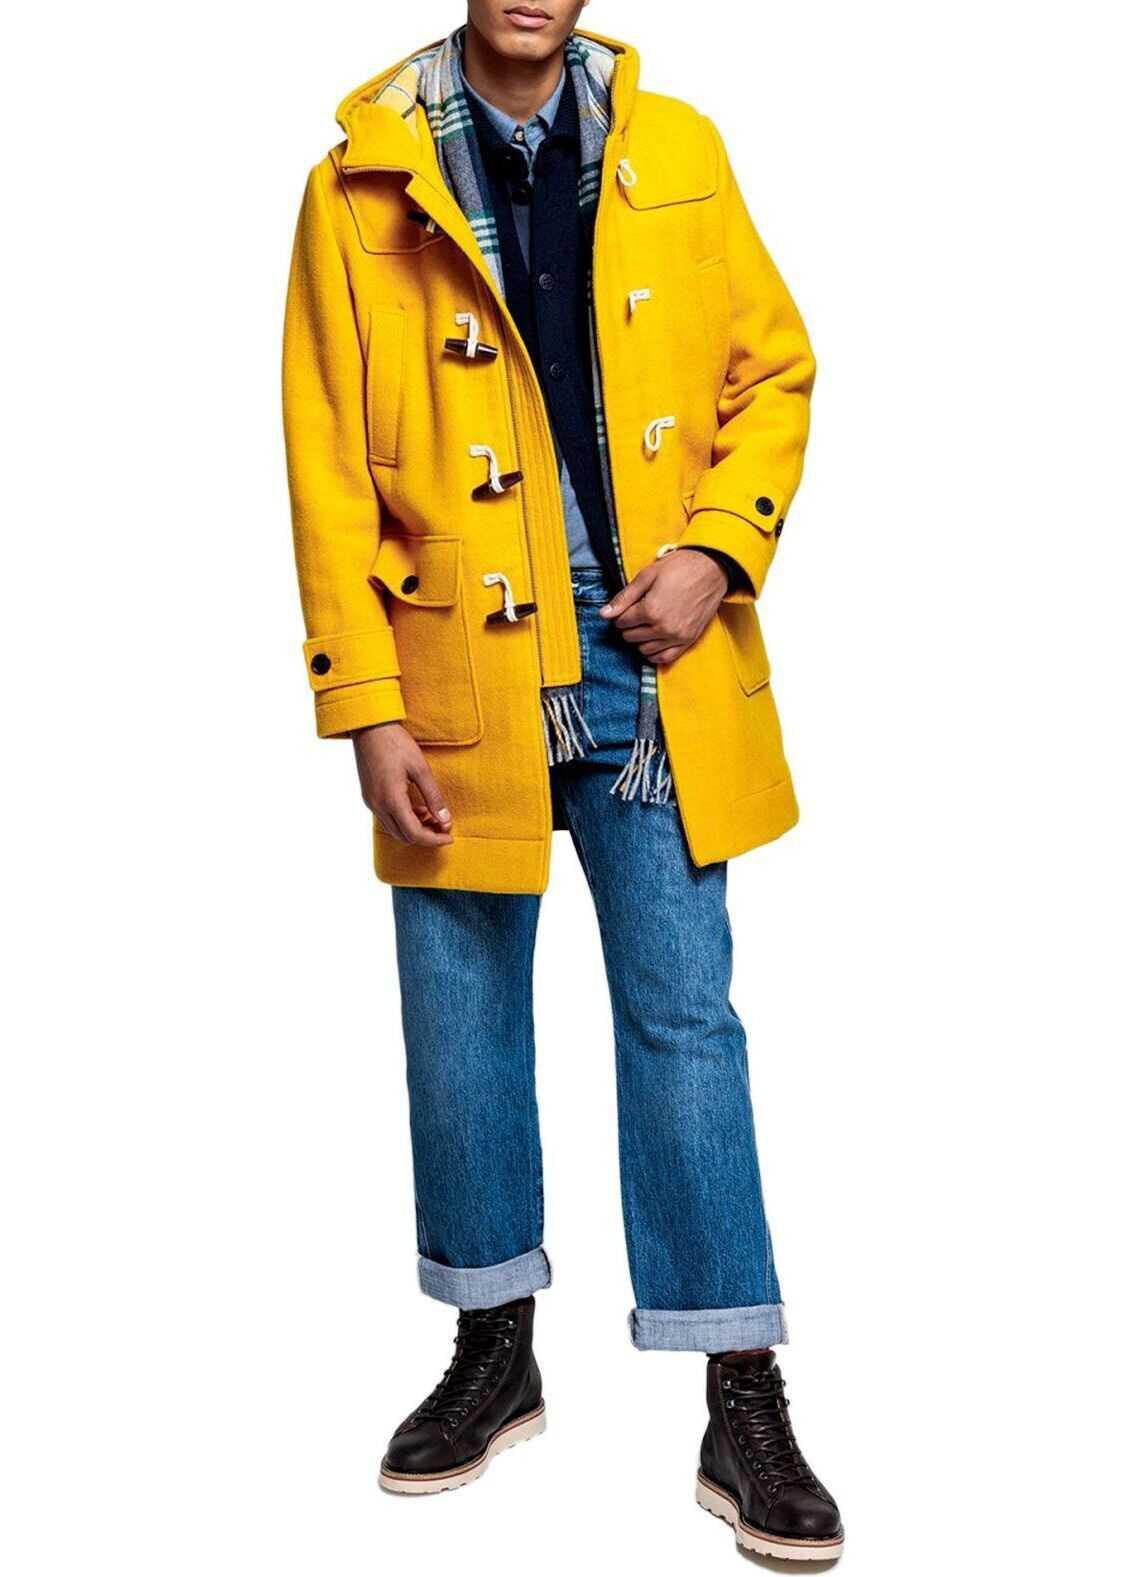 GANT Wool Coat YELLOW